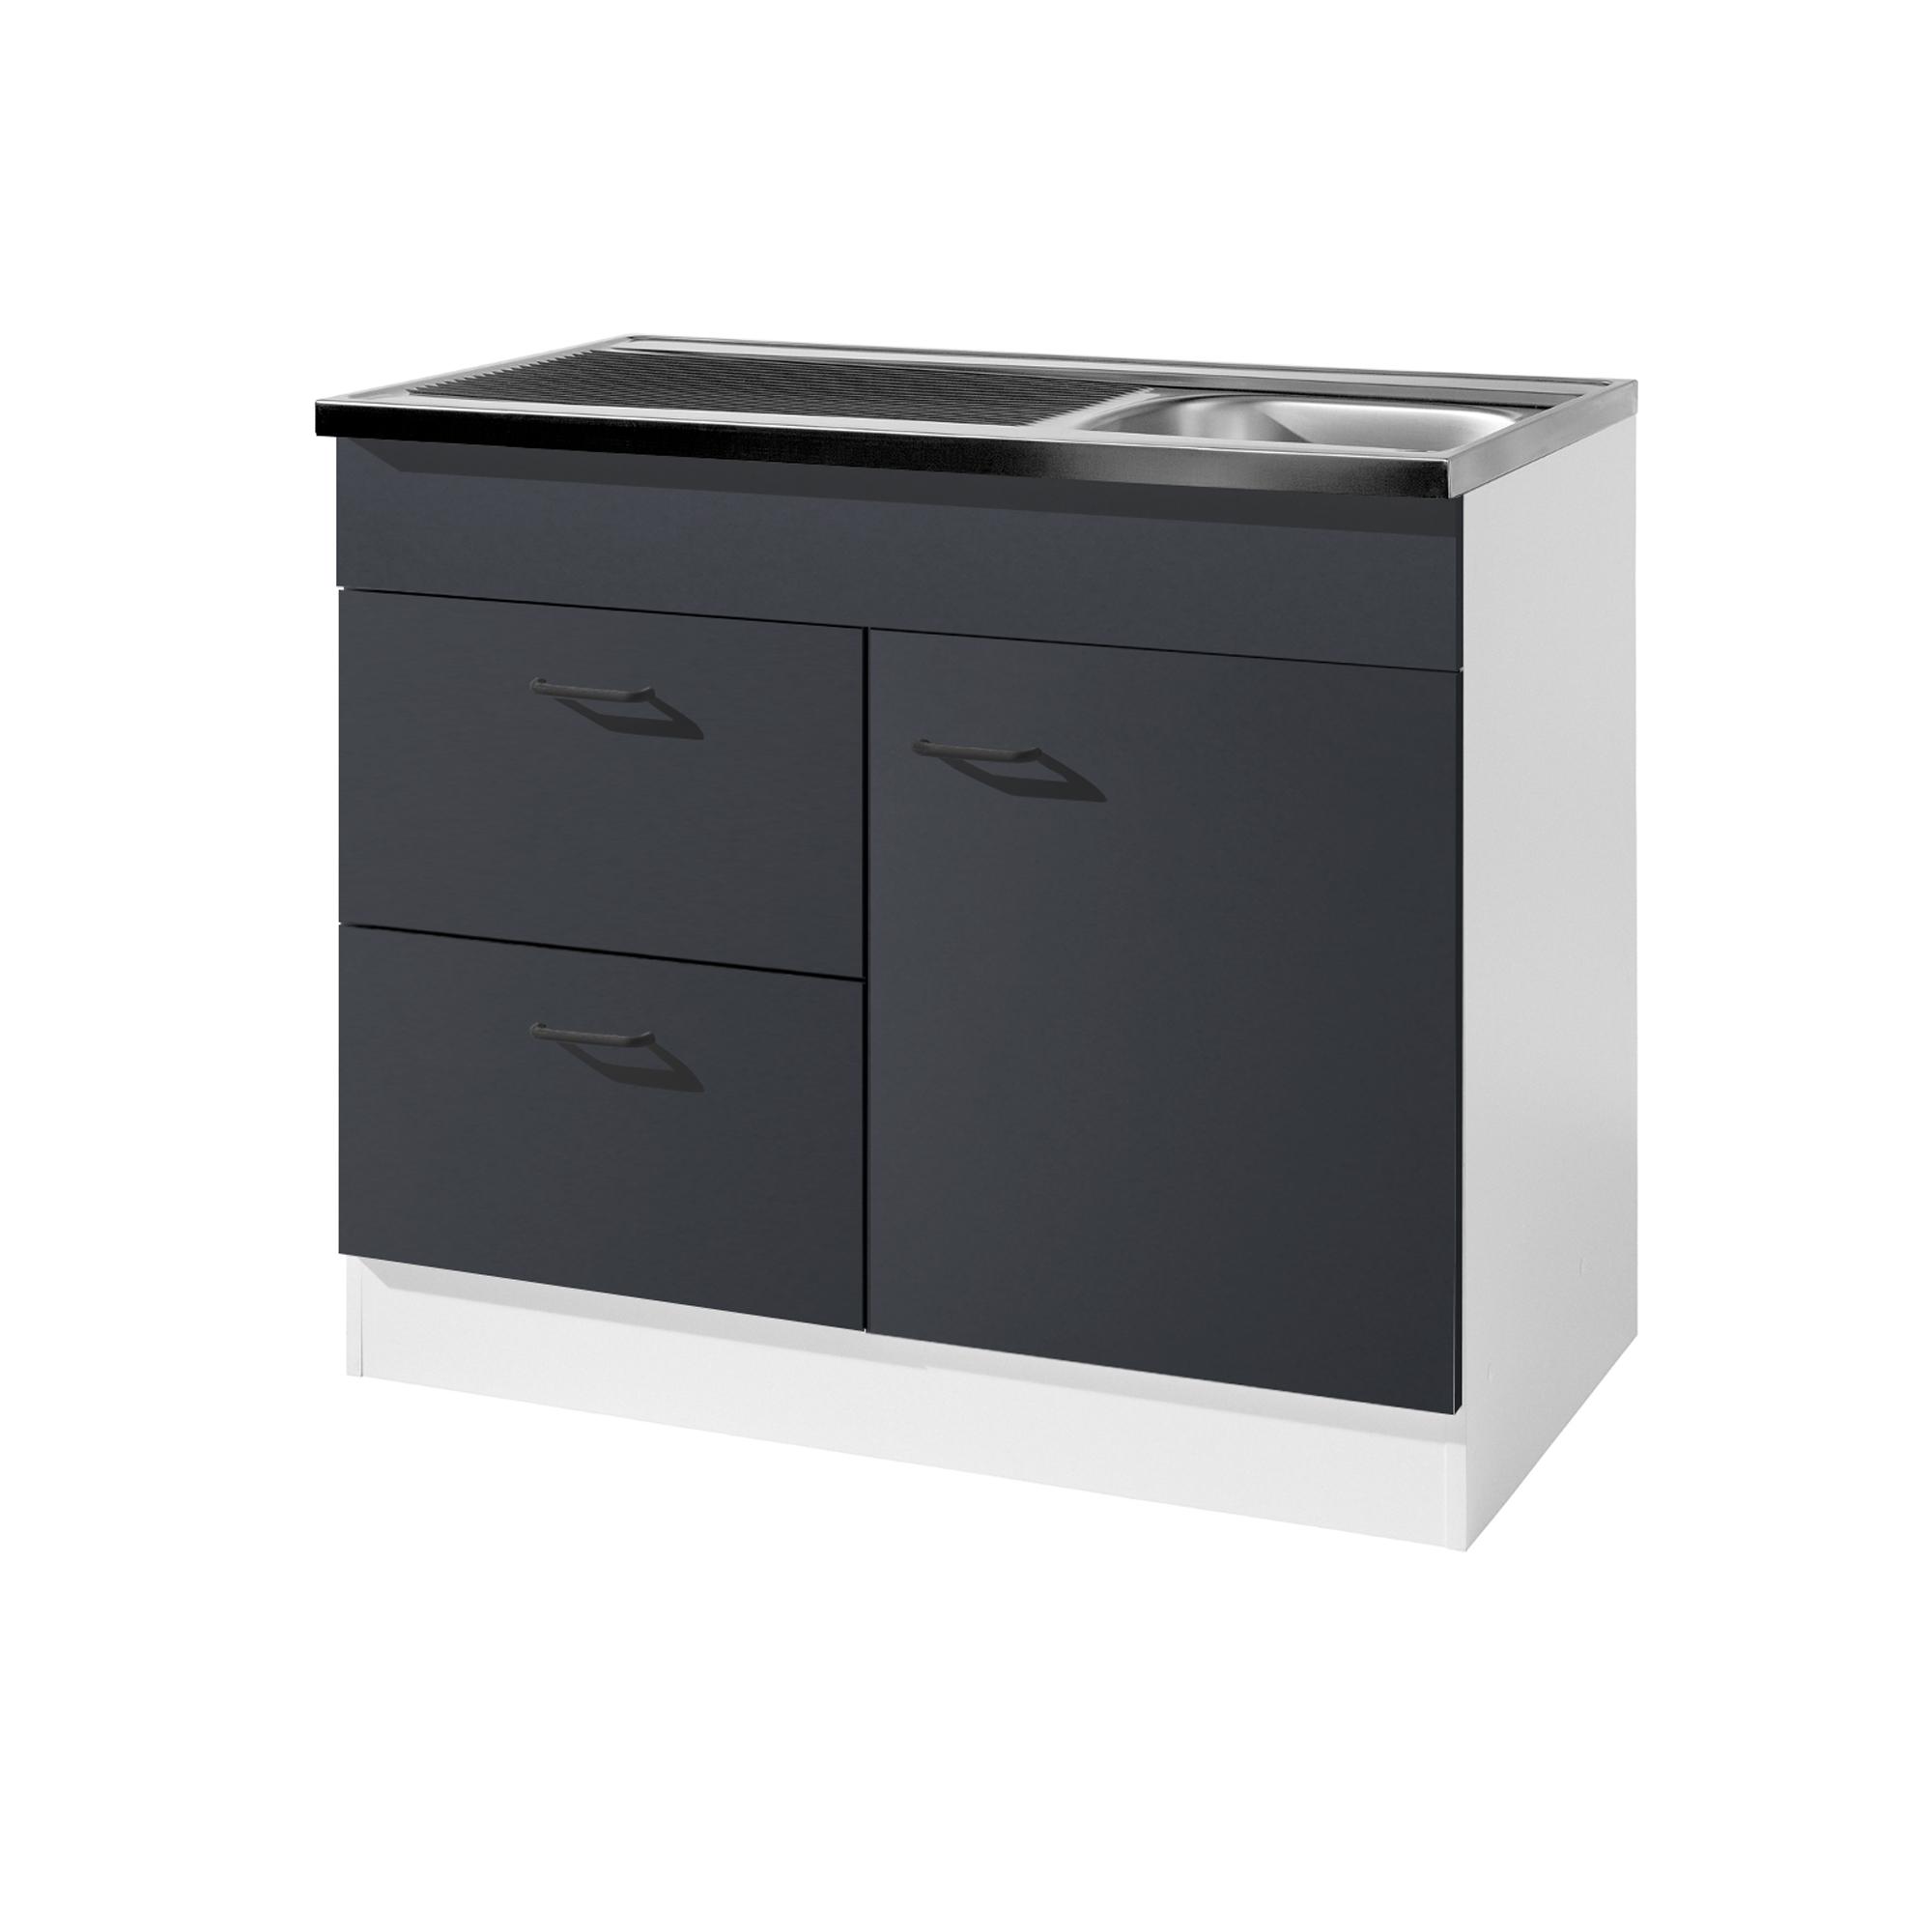 k chen sp lenschrank 1 t rig 2 ausz ge breite 100 cm tiefe 50 cm anthrazit k che. Black Bedroom Furniture Sets. Home Design Ideas